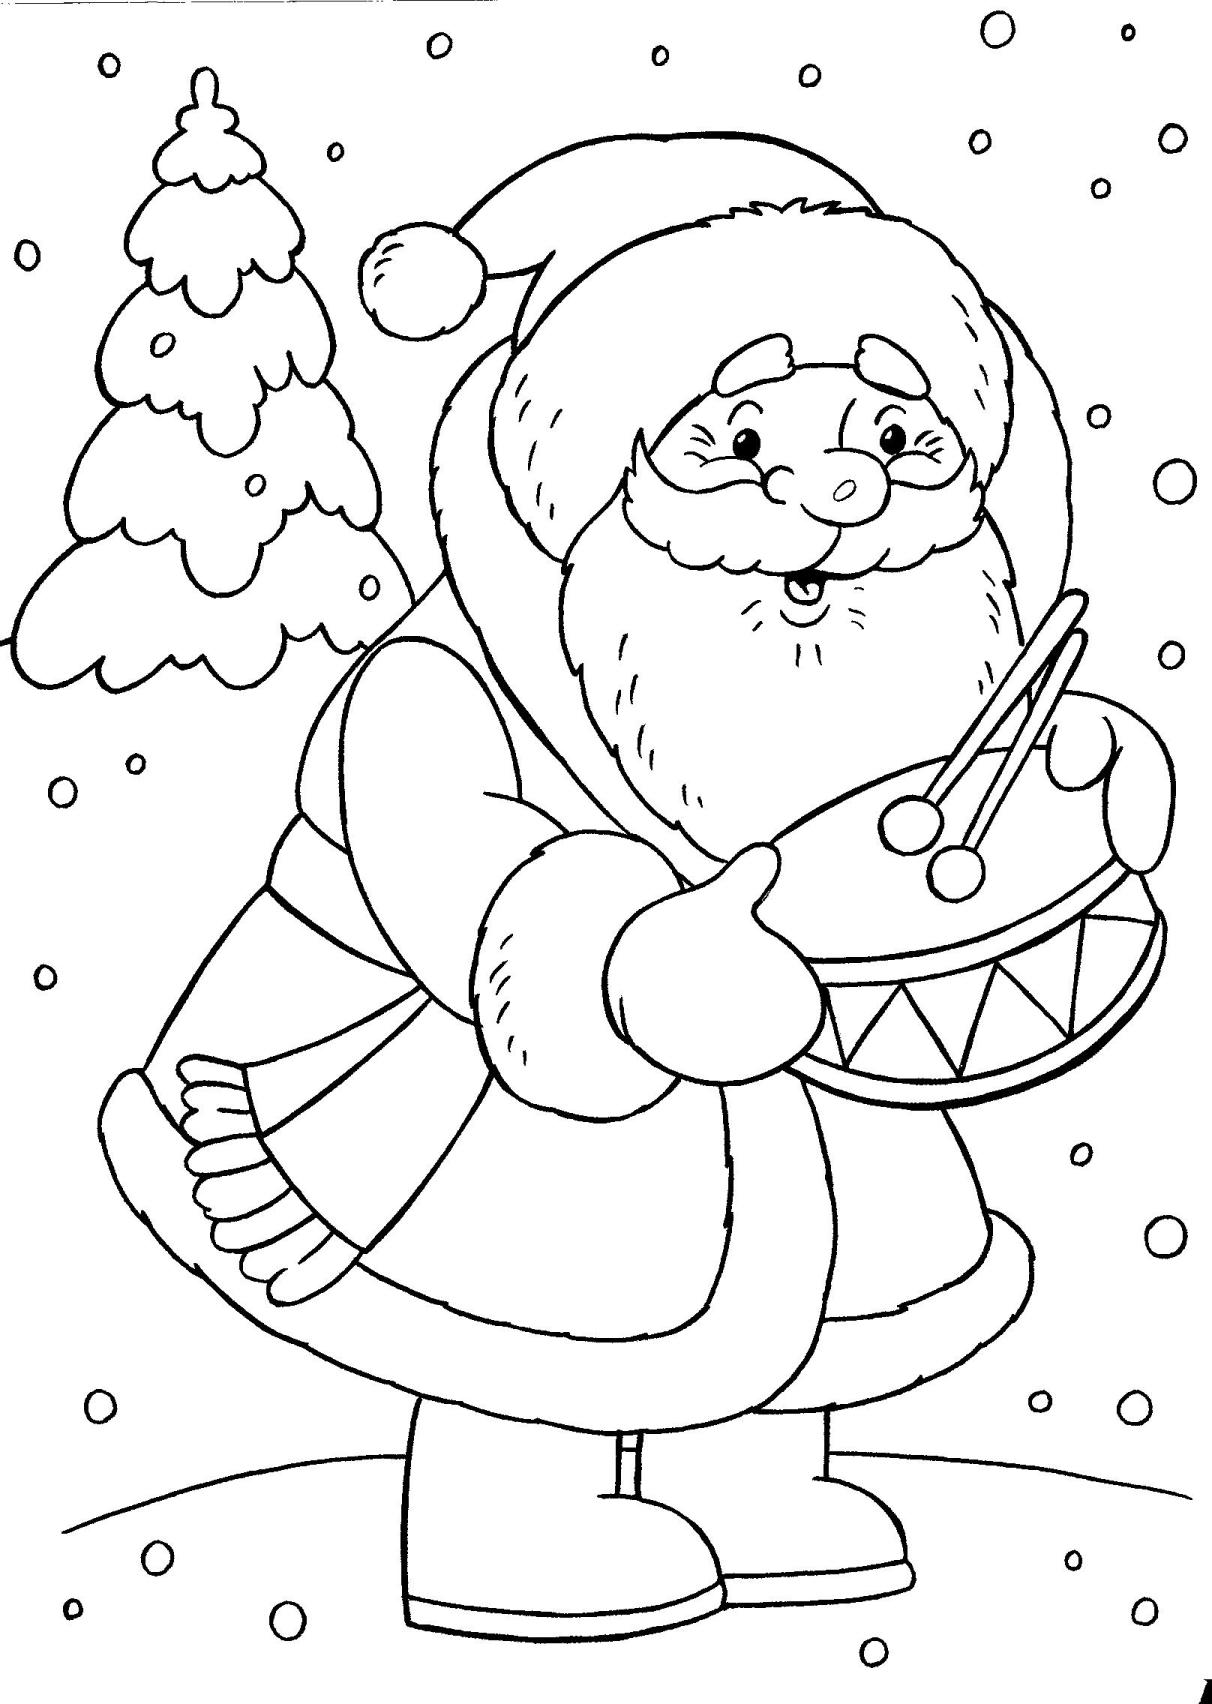 Онлайн раскраски для детей дед мороз